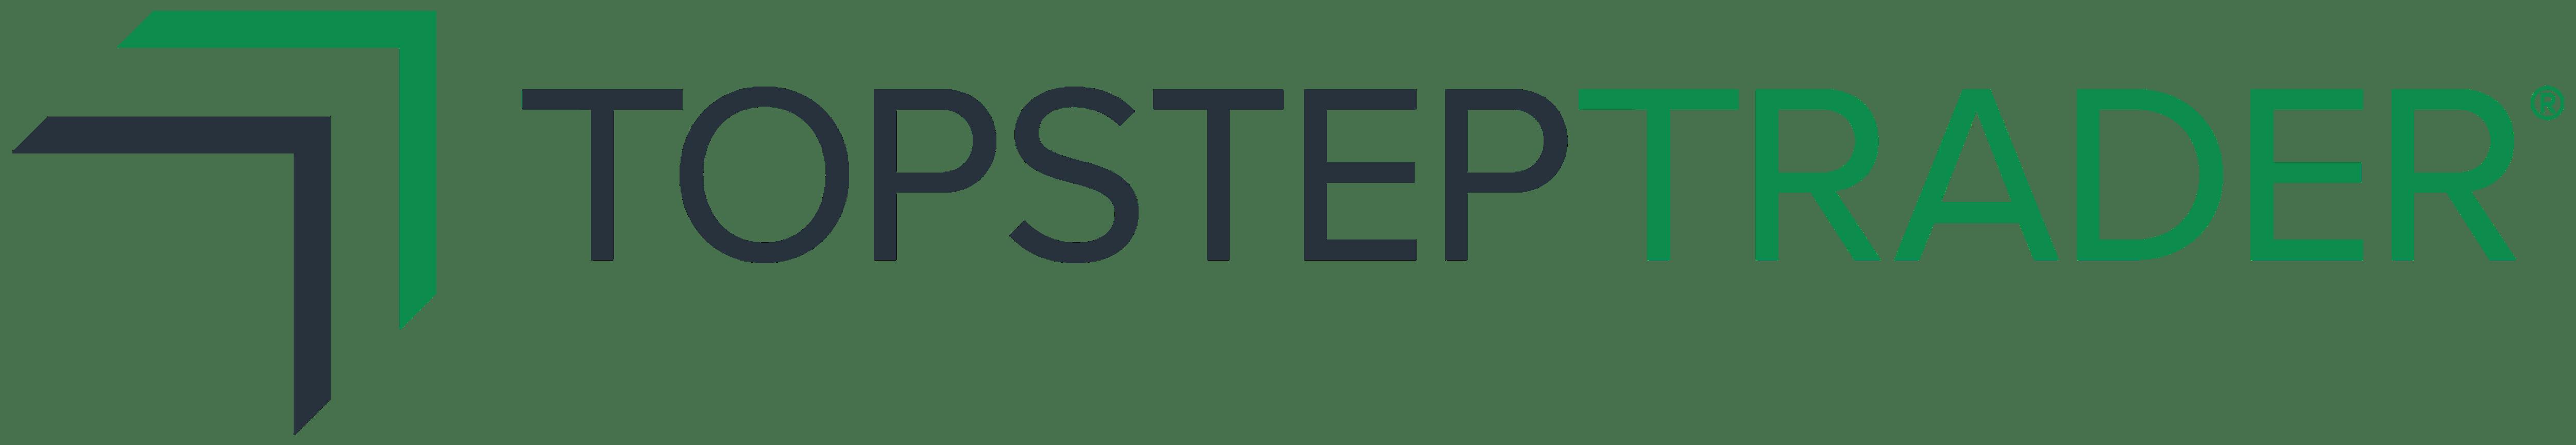 TopstepTrader Logo